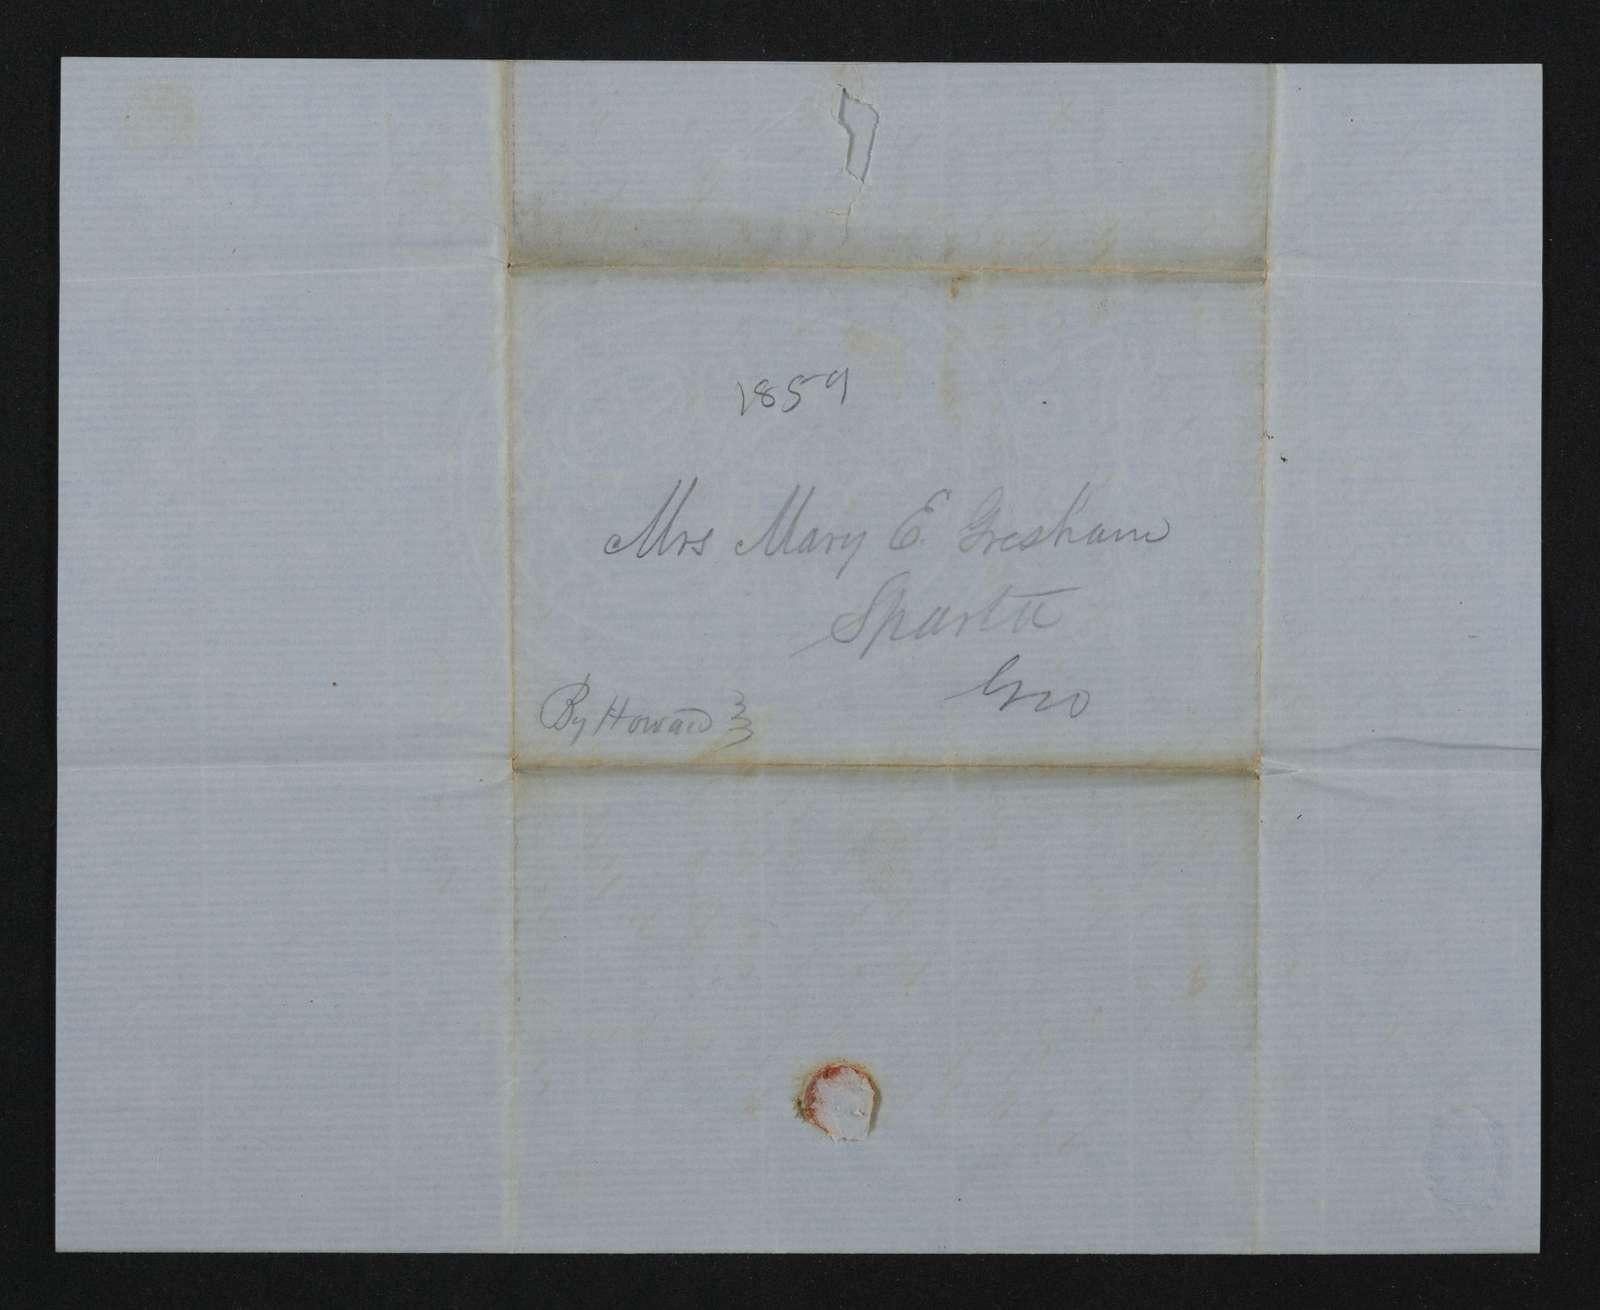 Lewis H. Machen Family Papers: Gresham Family Correspondence, 1834-1925; 1855-1859